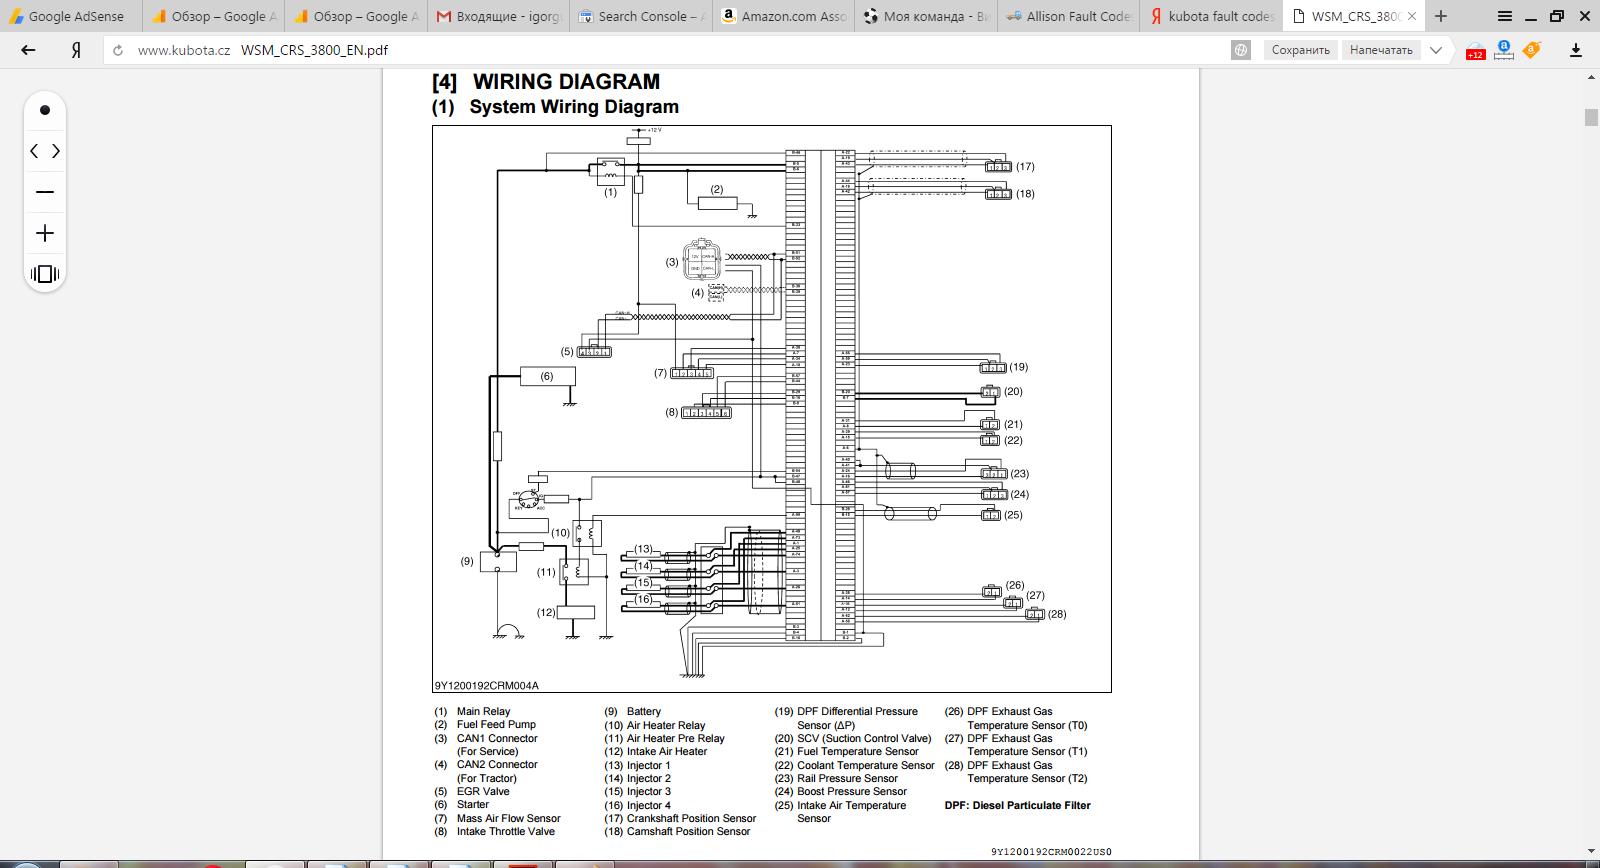 kubota wiring diagram pdf kubota wiring diagram pdf 3200b \u2022 free Kubota L39 Parts Diagram kubota tractor starter solenoid wiring diagram free download